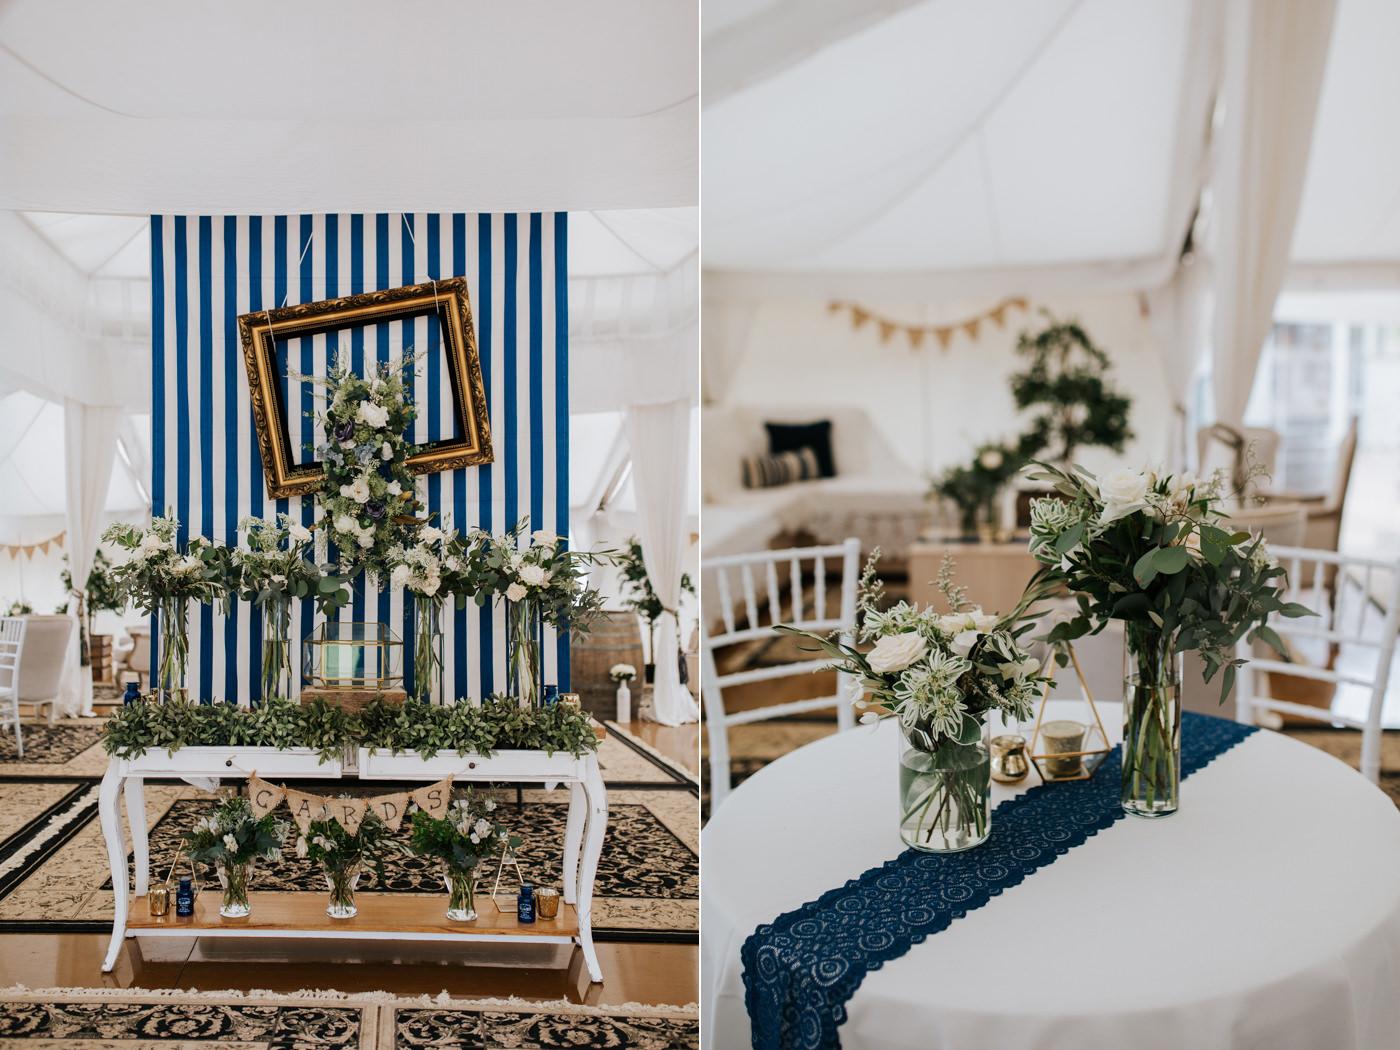 Nick & Vanezza - Fernbank Farm Wedding - Samantha Heather Photography-46.jpg